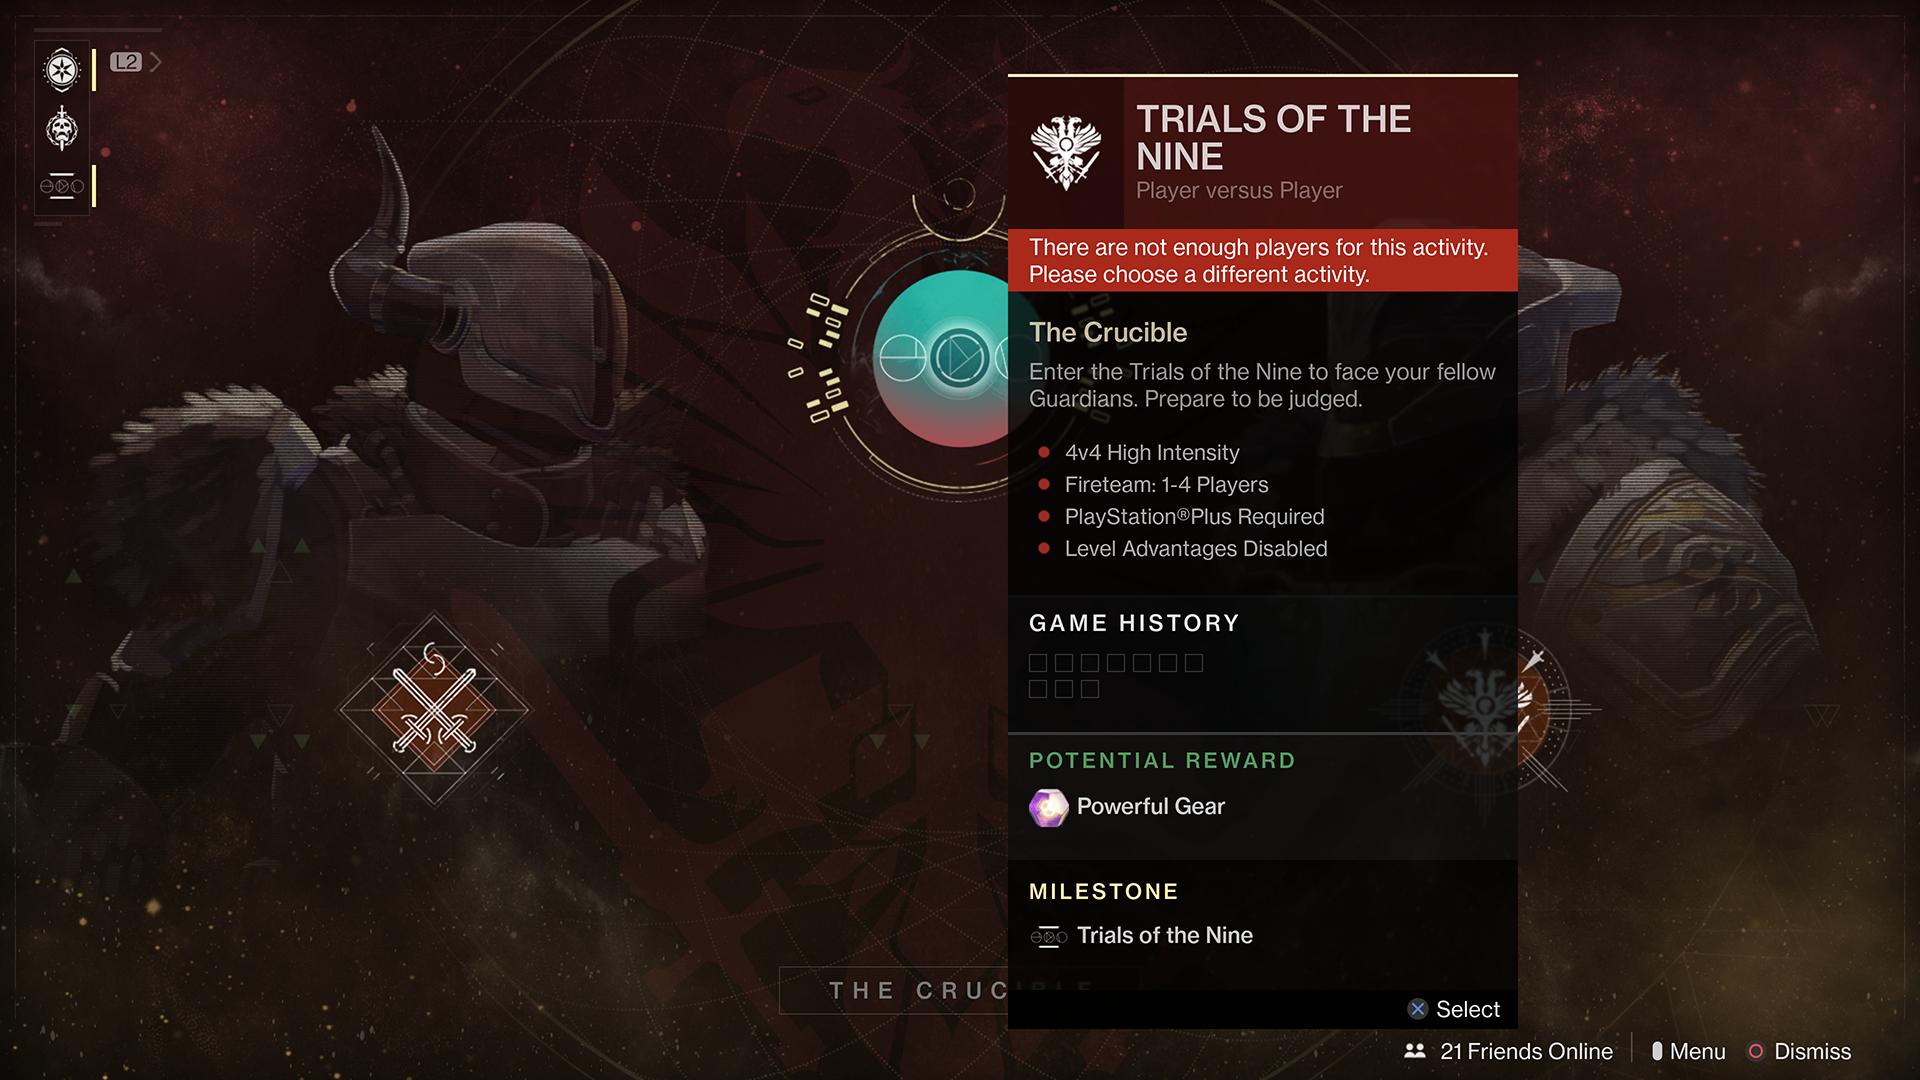 destiny 2 how to delete trials card